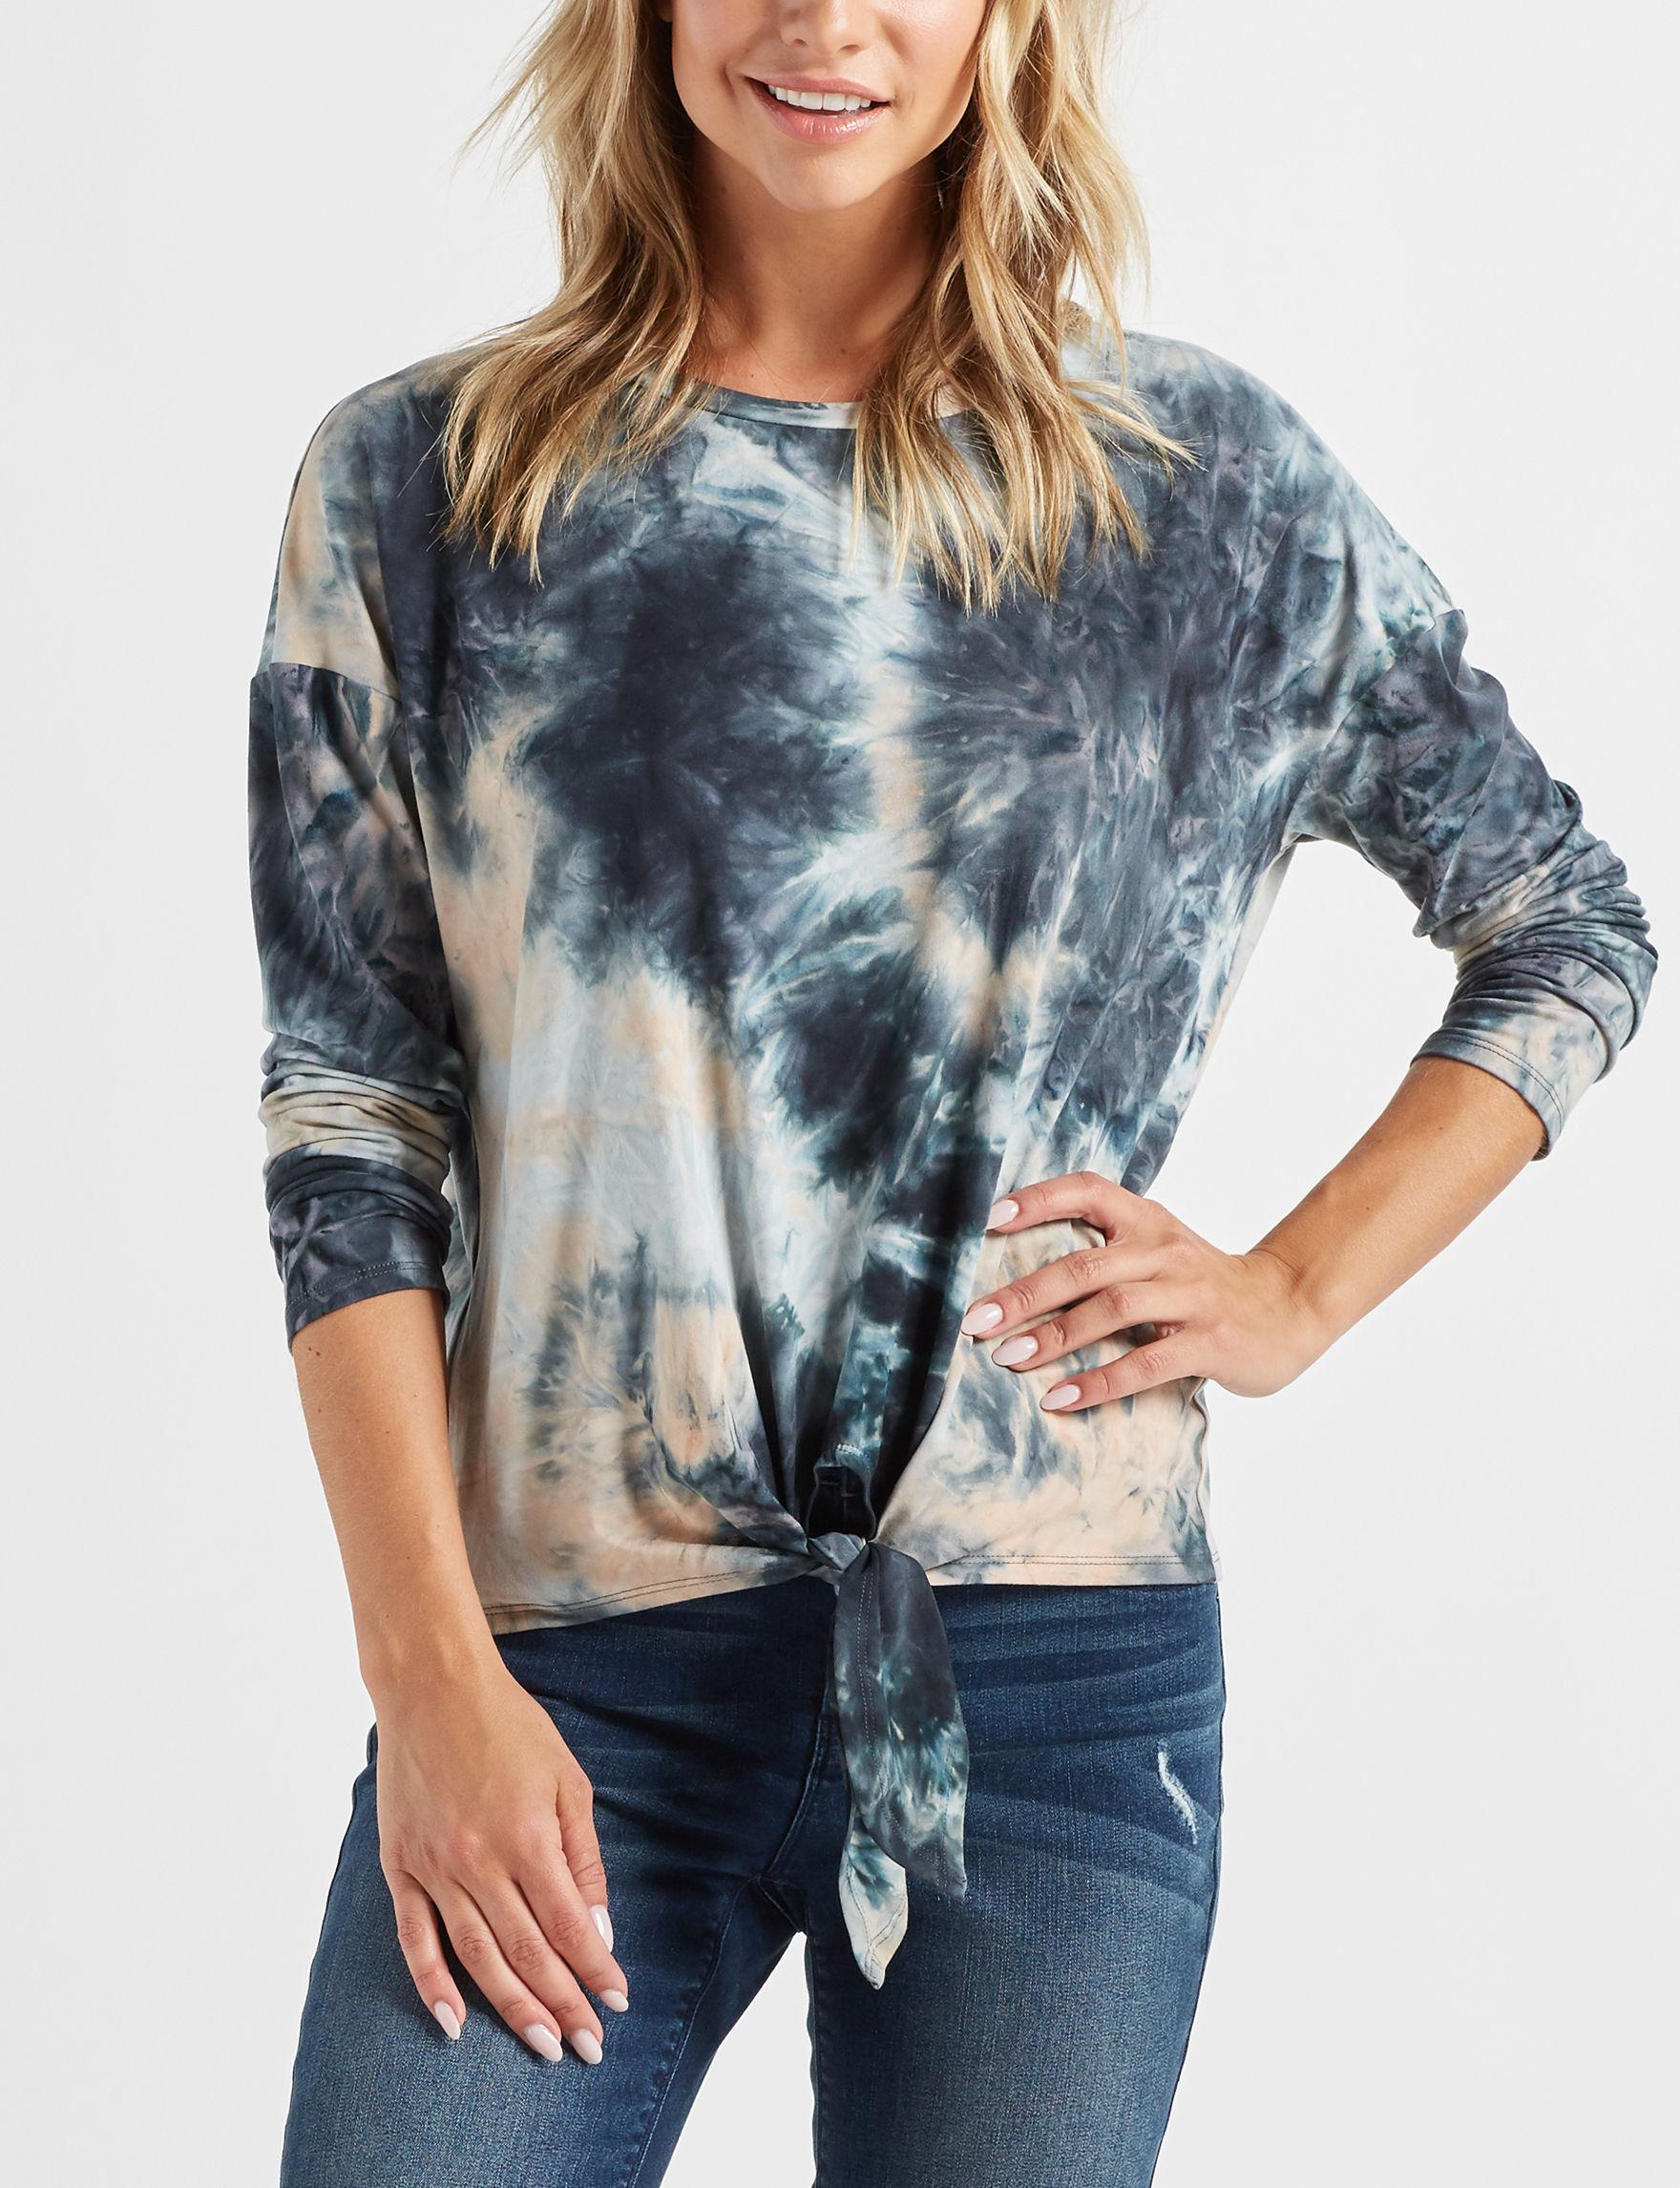 Signature Studio Tie Dye Shirts & Blouses